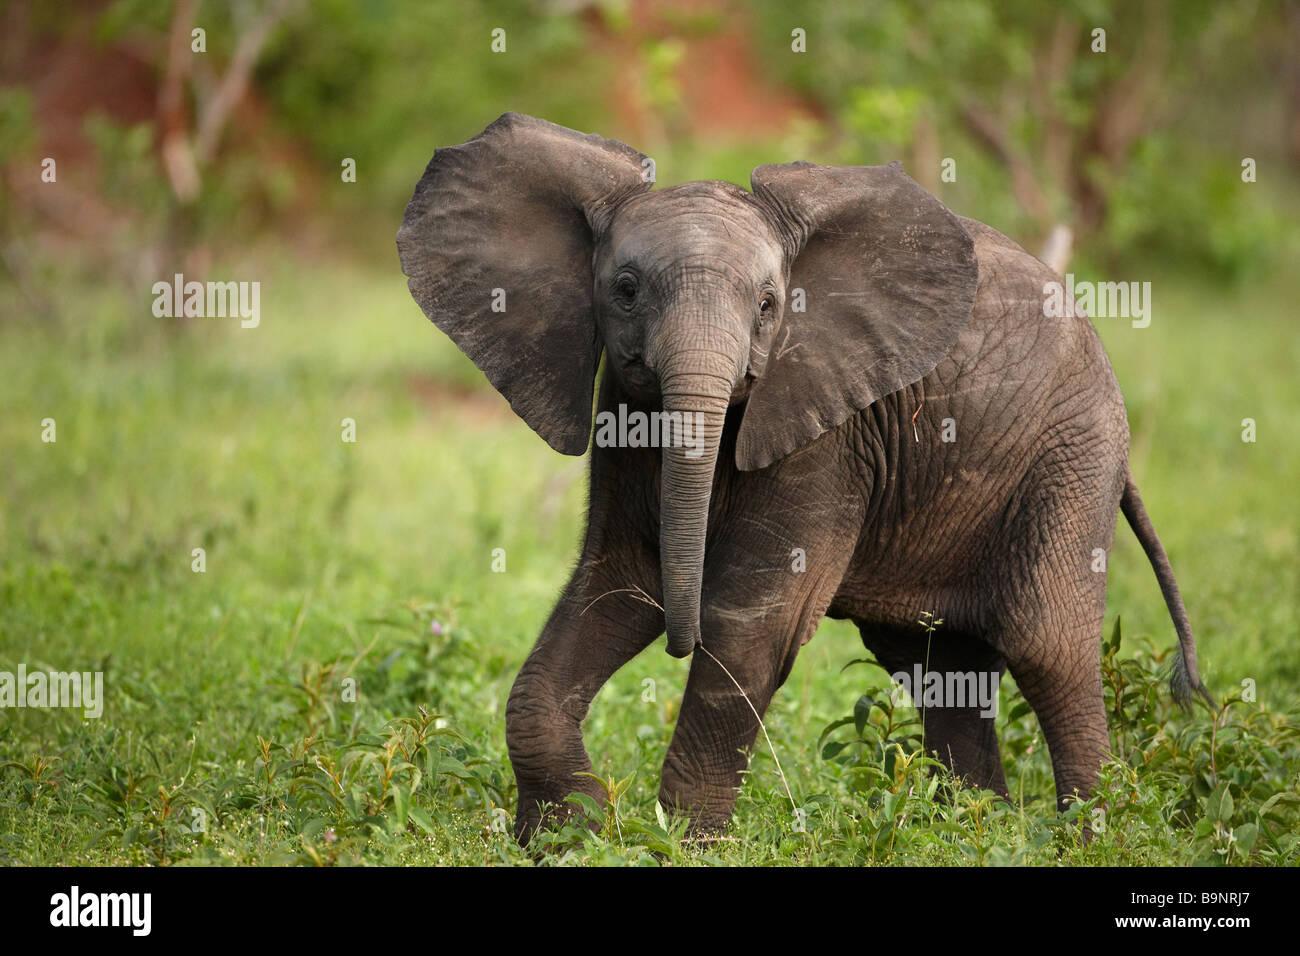 Giocoso lone baby elephant nella boccola, Kruger National Park, Sud Africa Immagini Stock